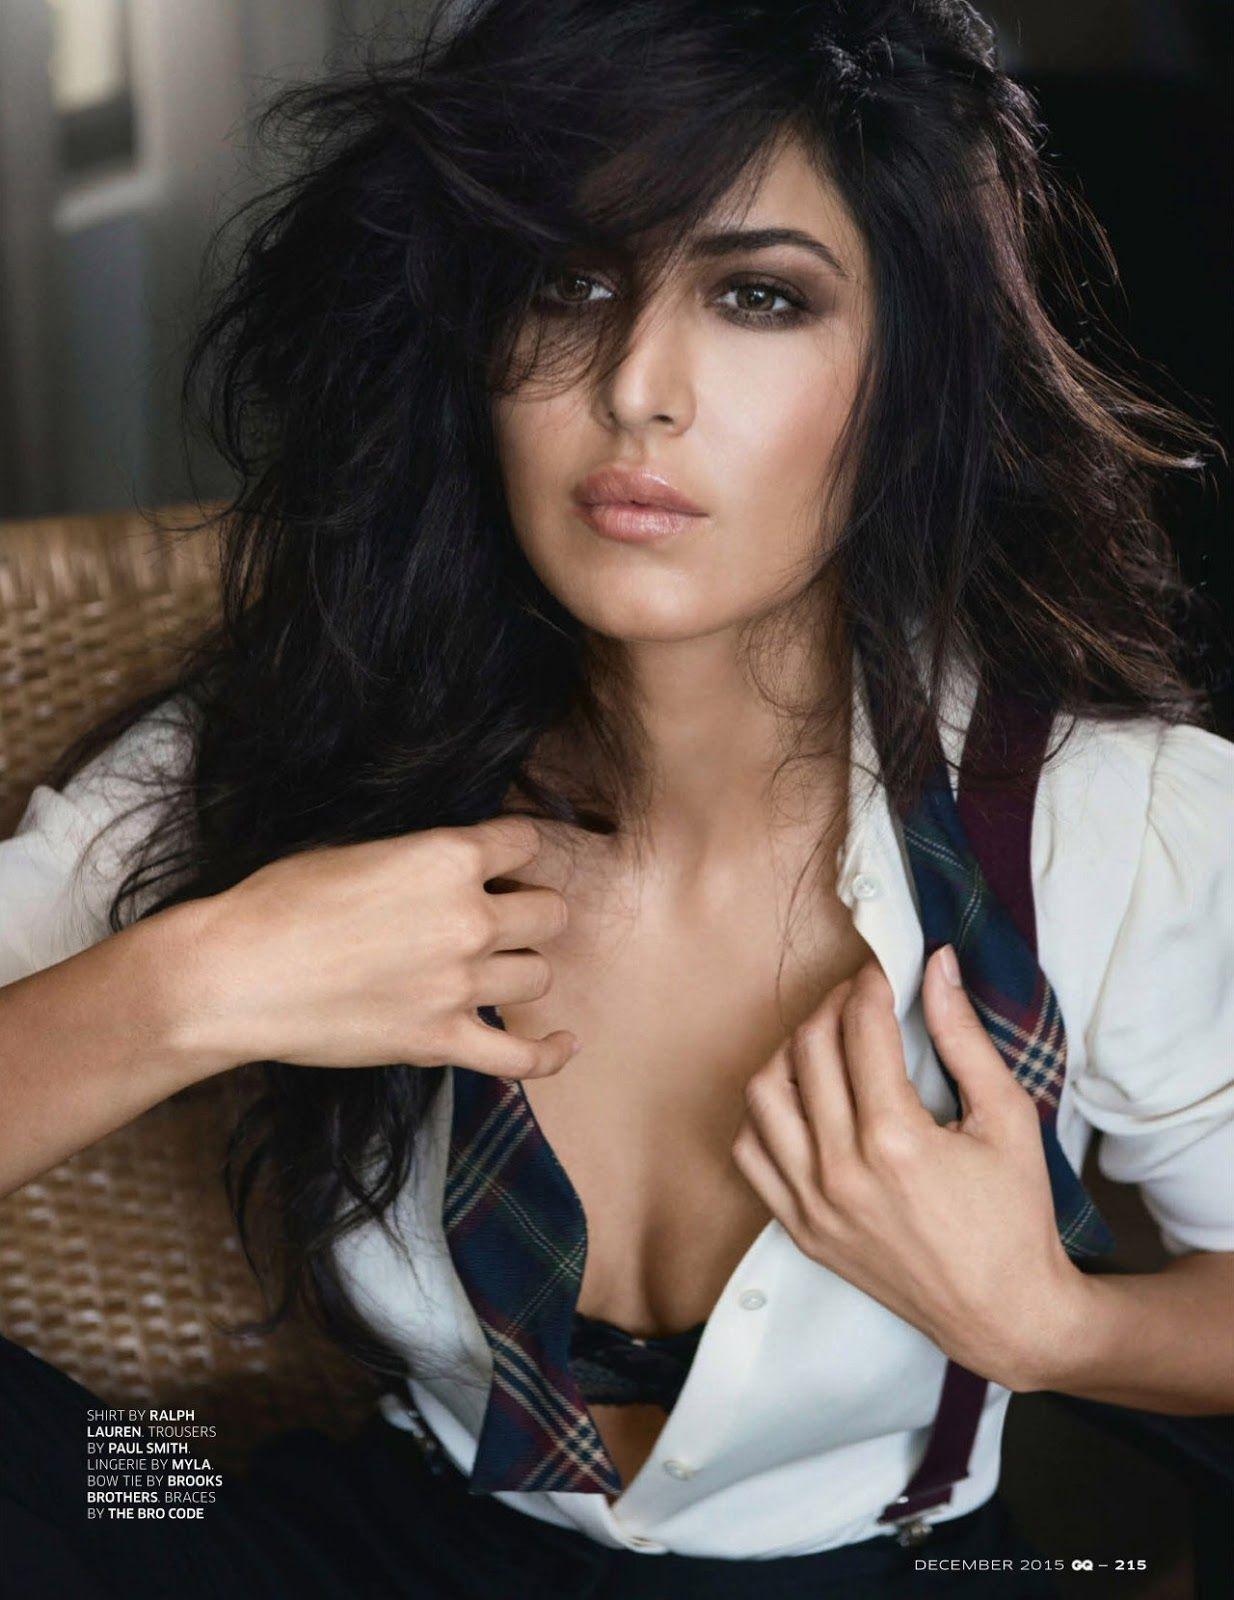 the hot and sexy masala bollywood fame actress katrina kaif very